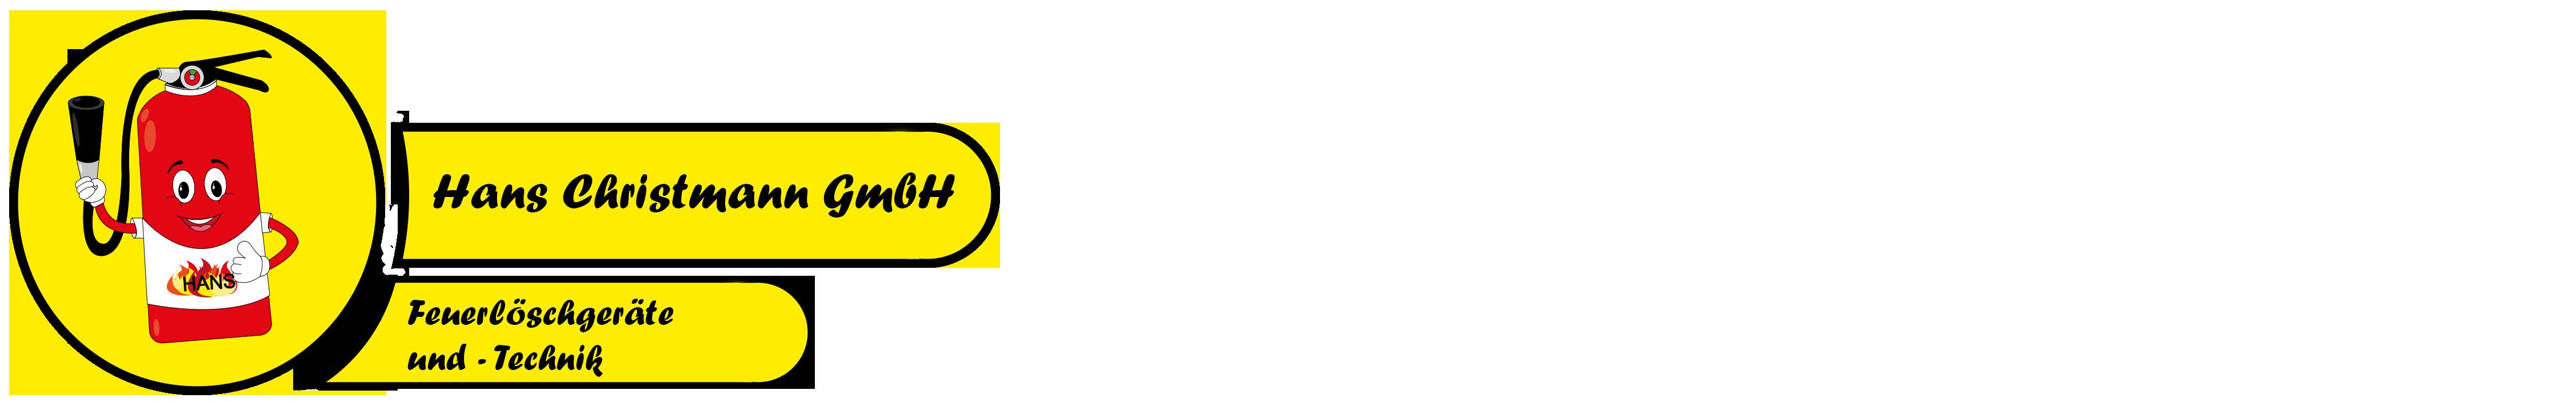 Hans Christmann GmbH Logo